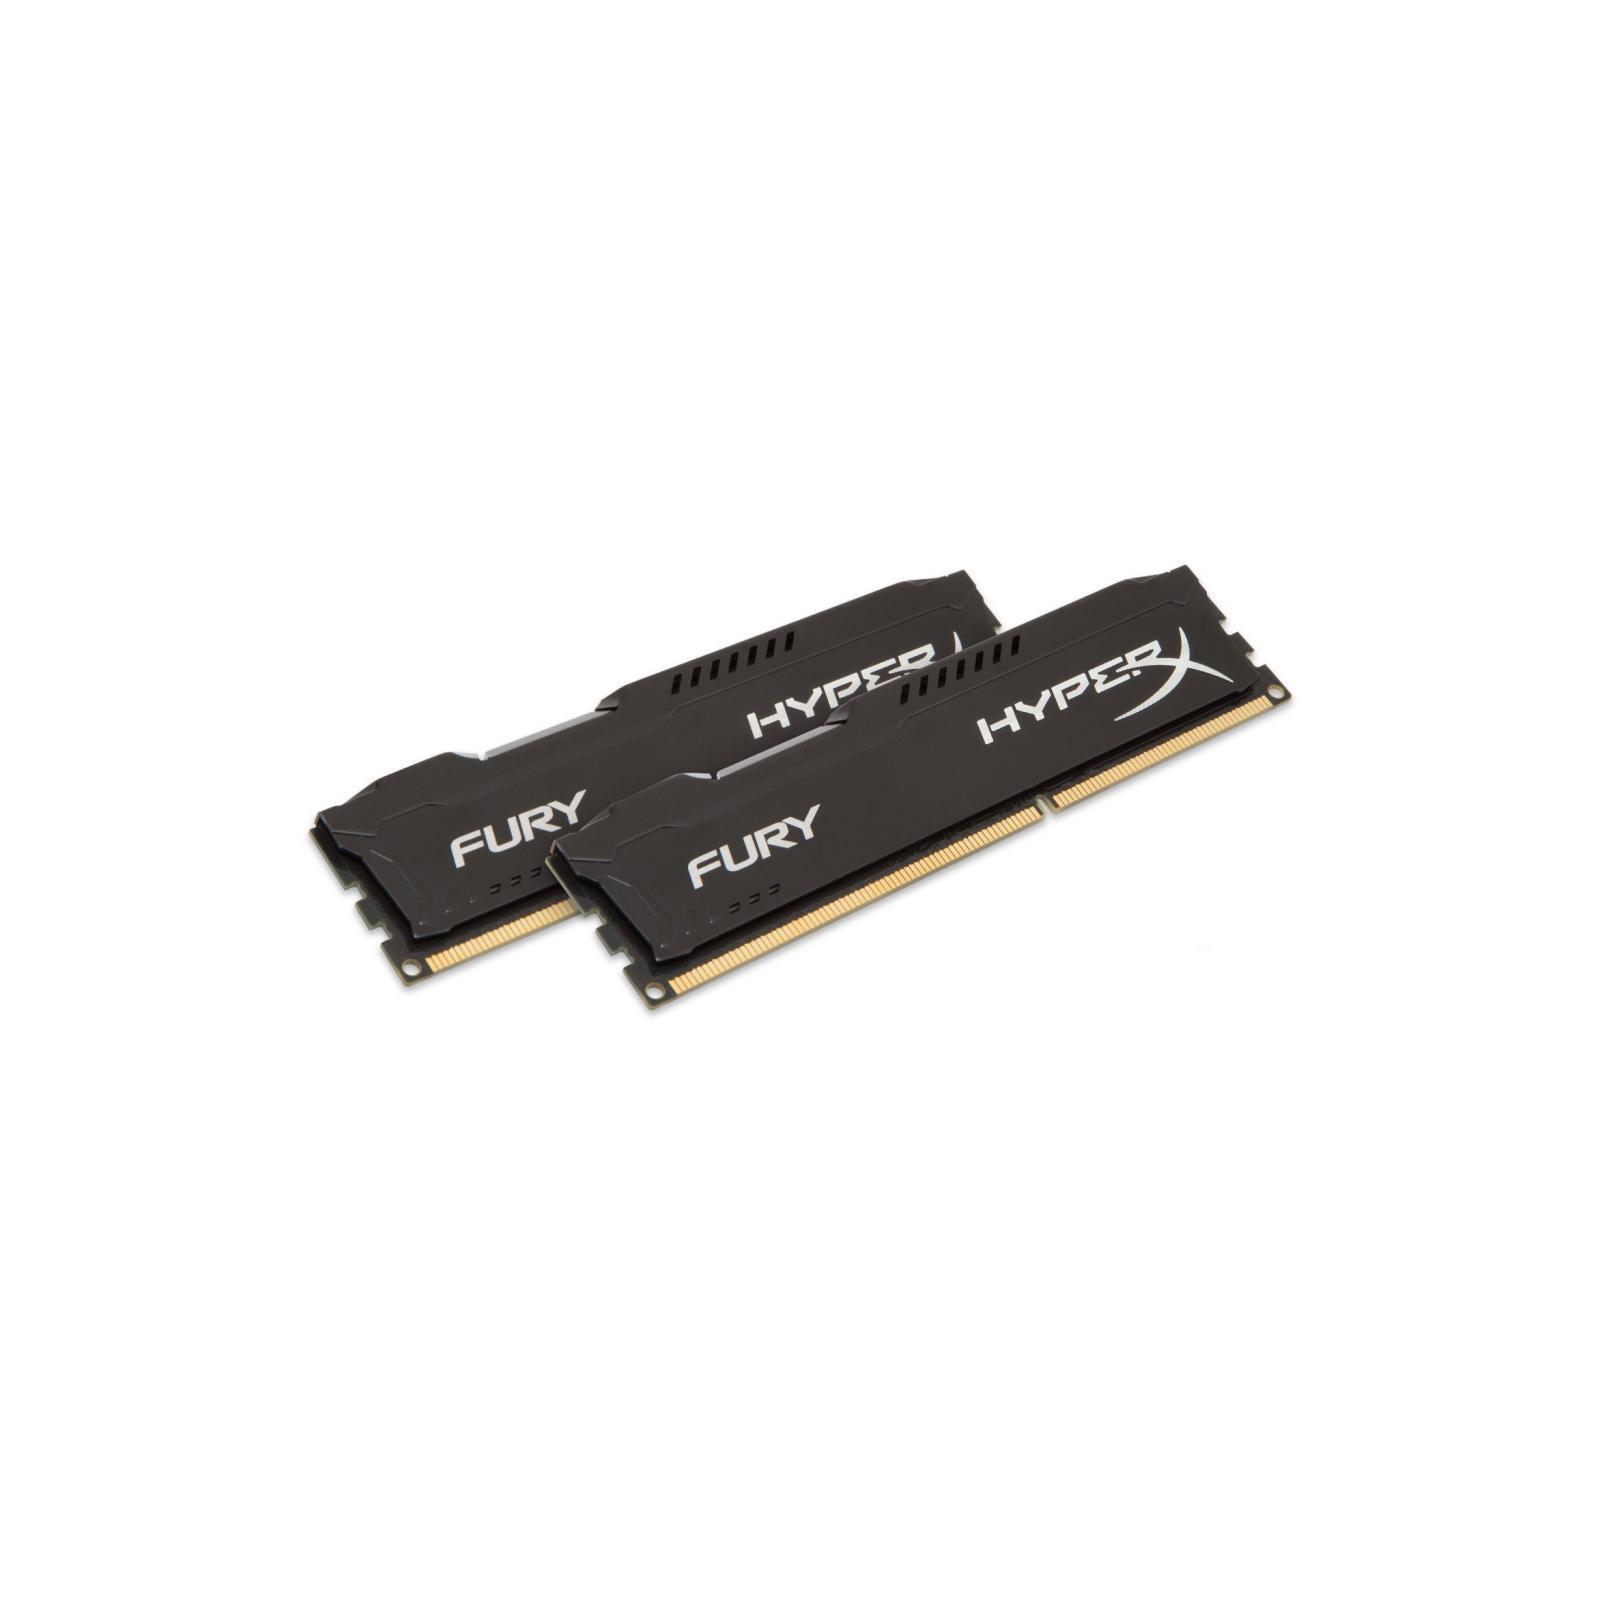 Модуль памяти для компьютера DDR4 32GB (2x16GB) 3466 MHz HyperX FURY Black HyperX (Kingston Fury) (HX434C19FBK2/32) изображение 2